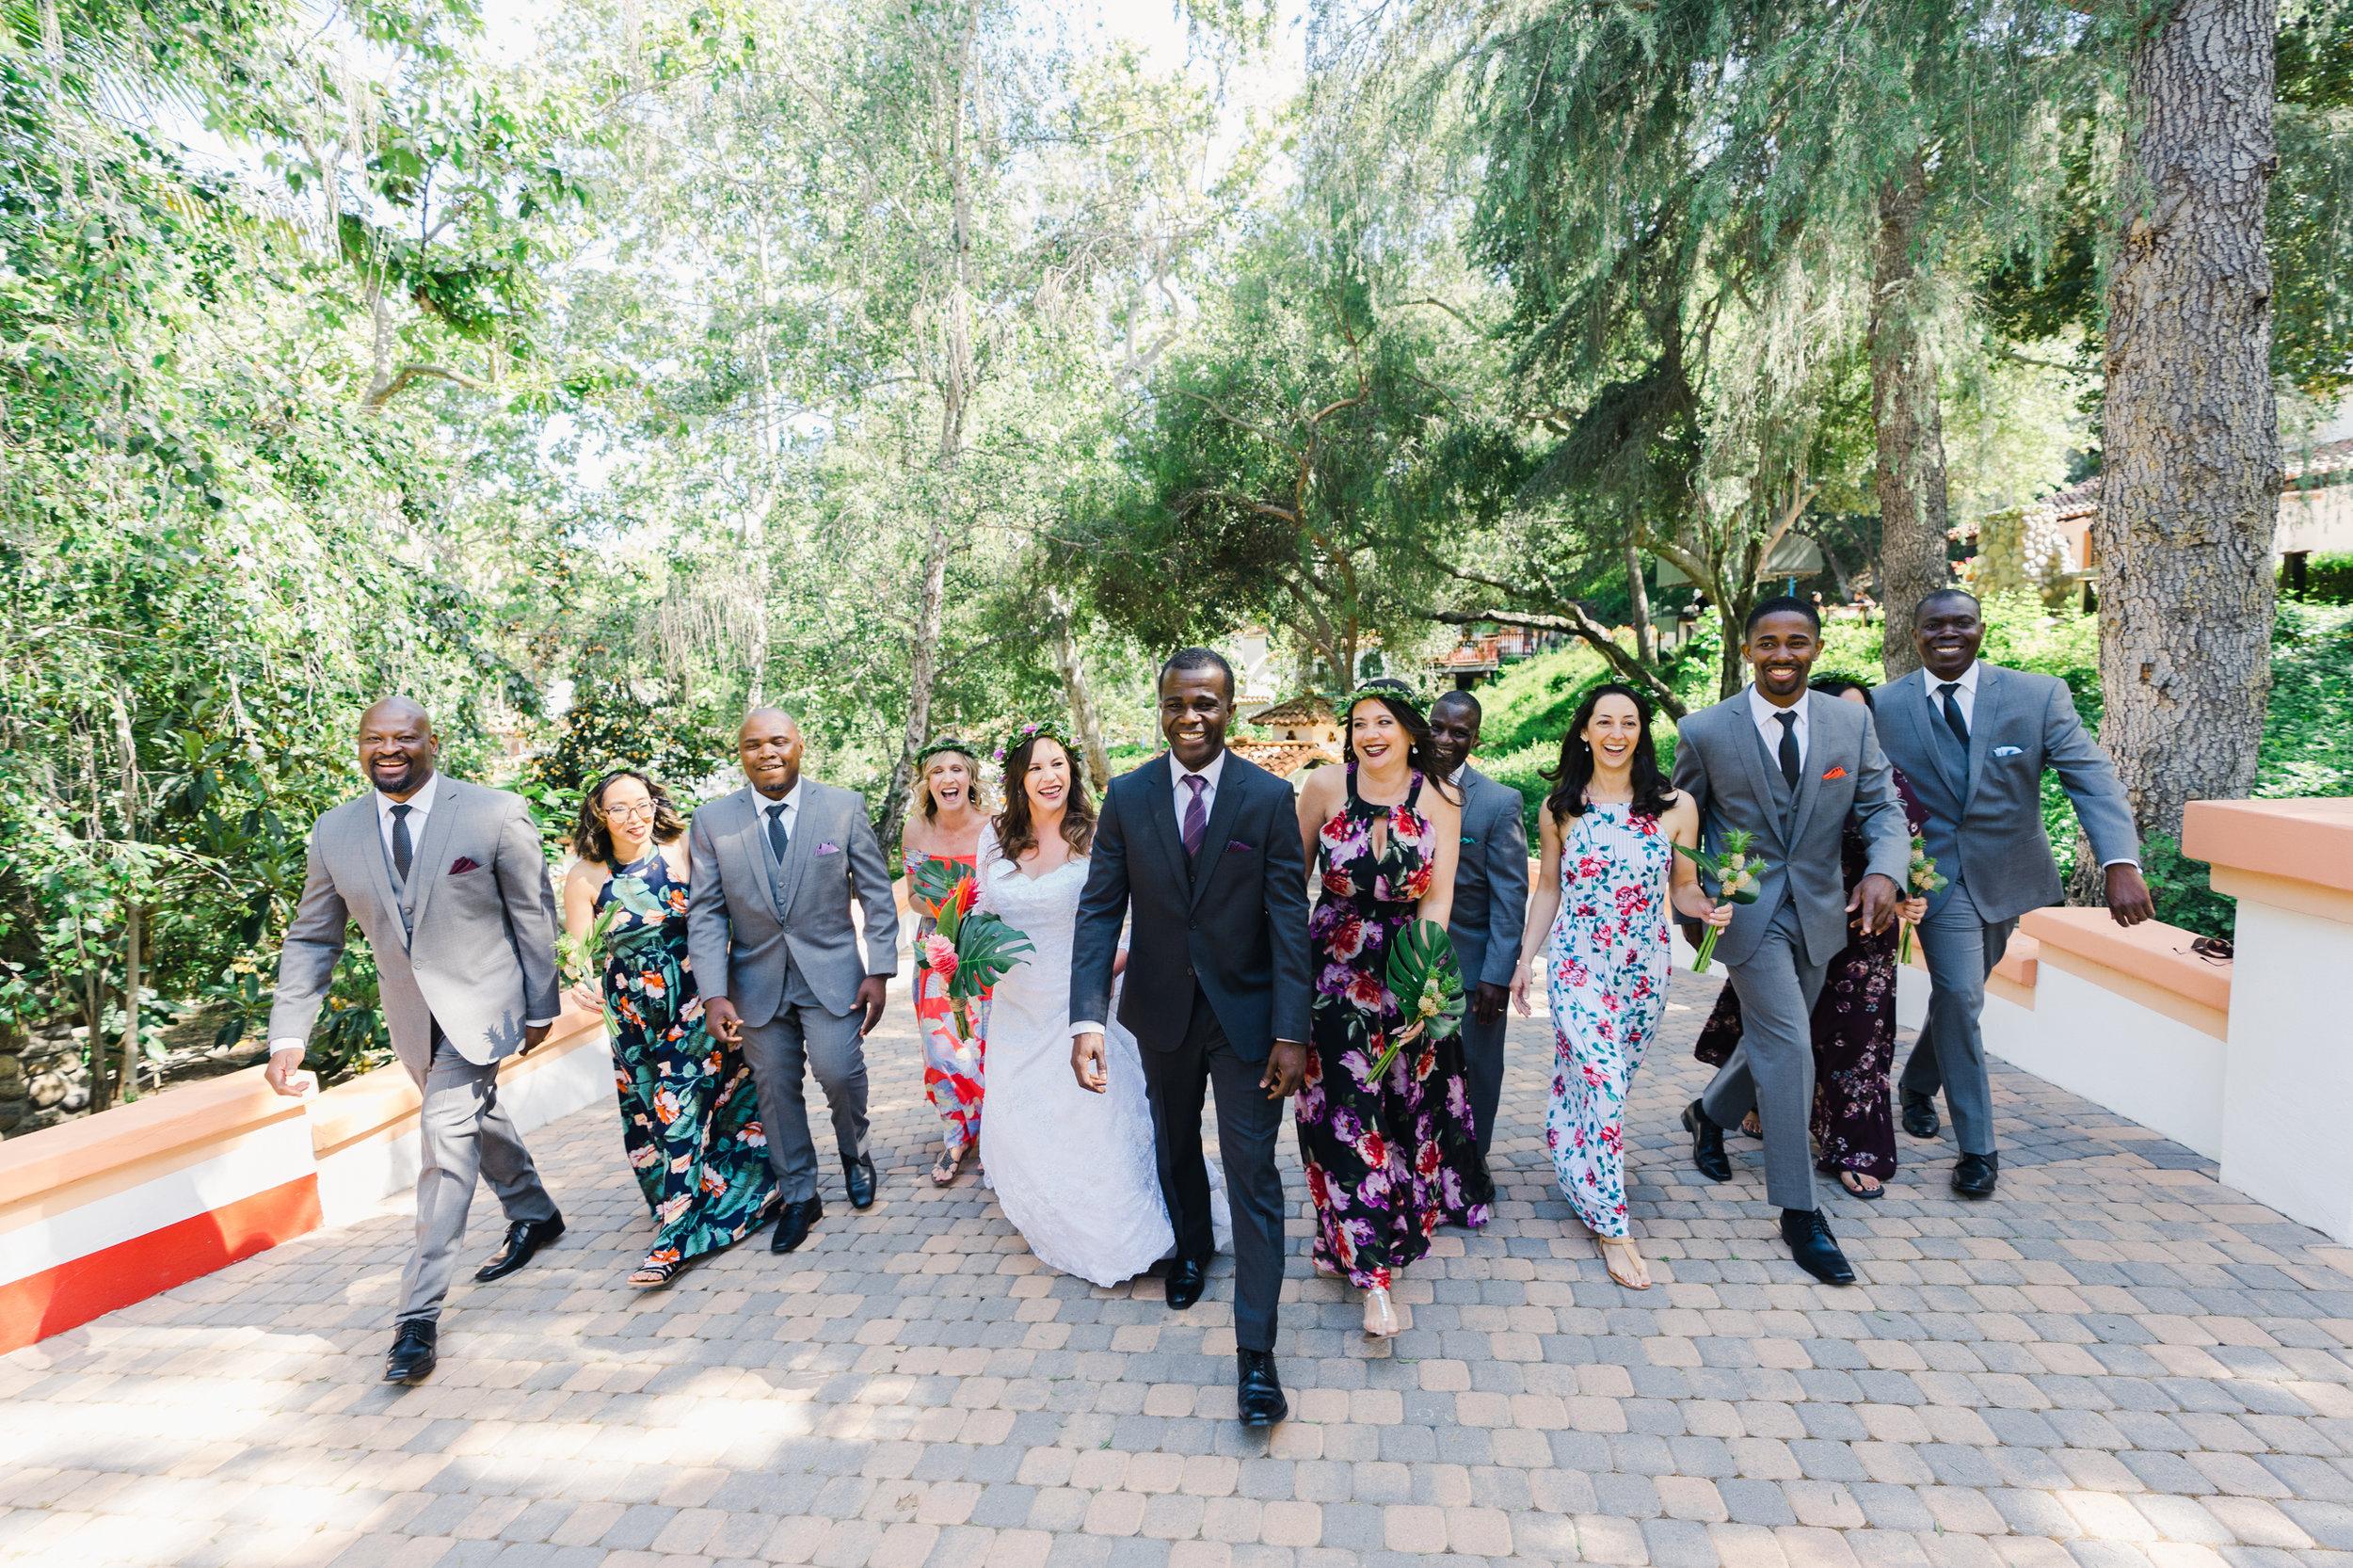 rancho-las-lomas-wedding-kelsey-sim_0084.JPG